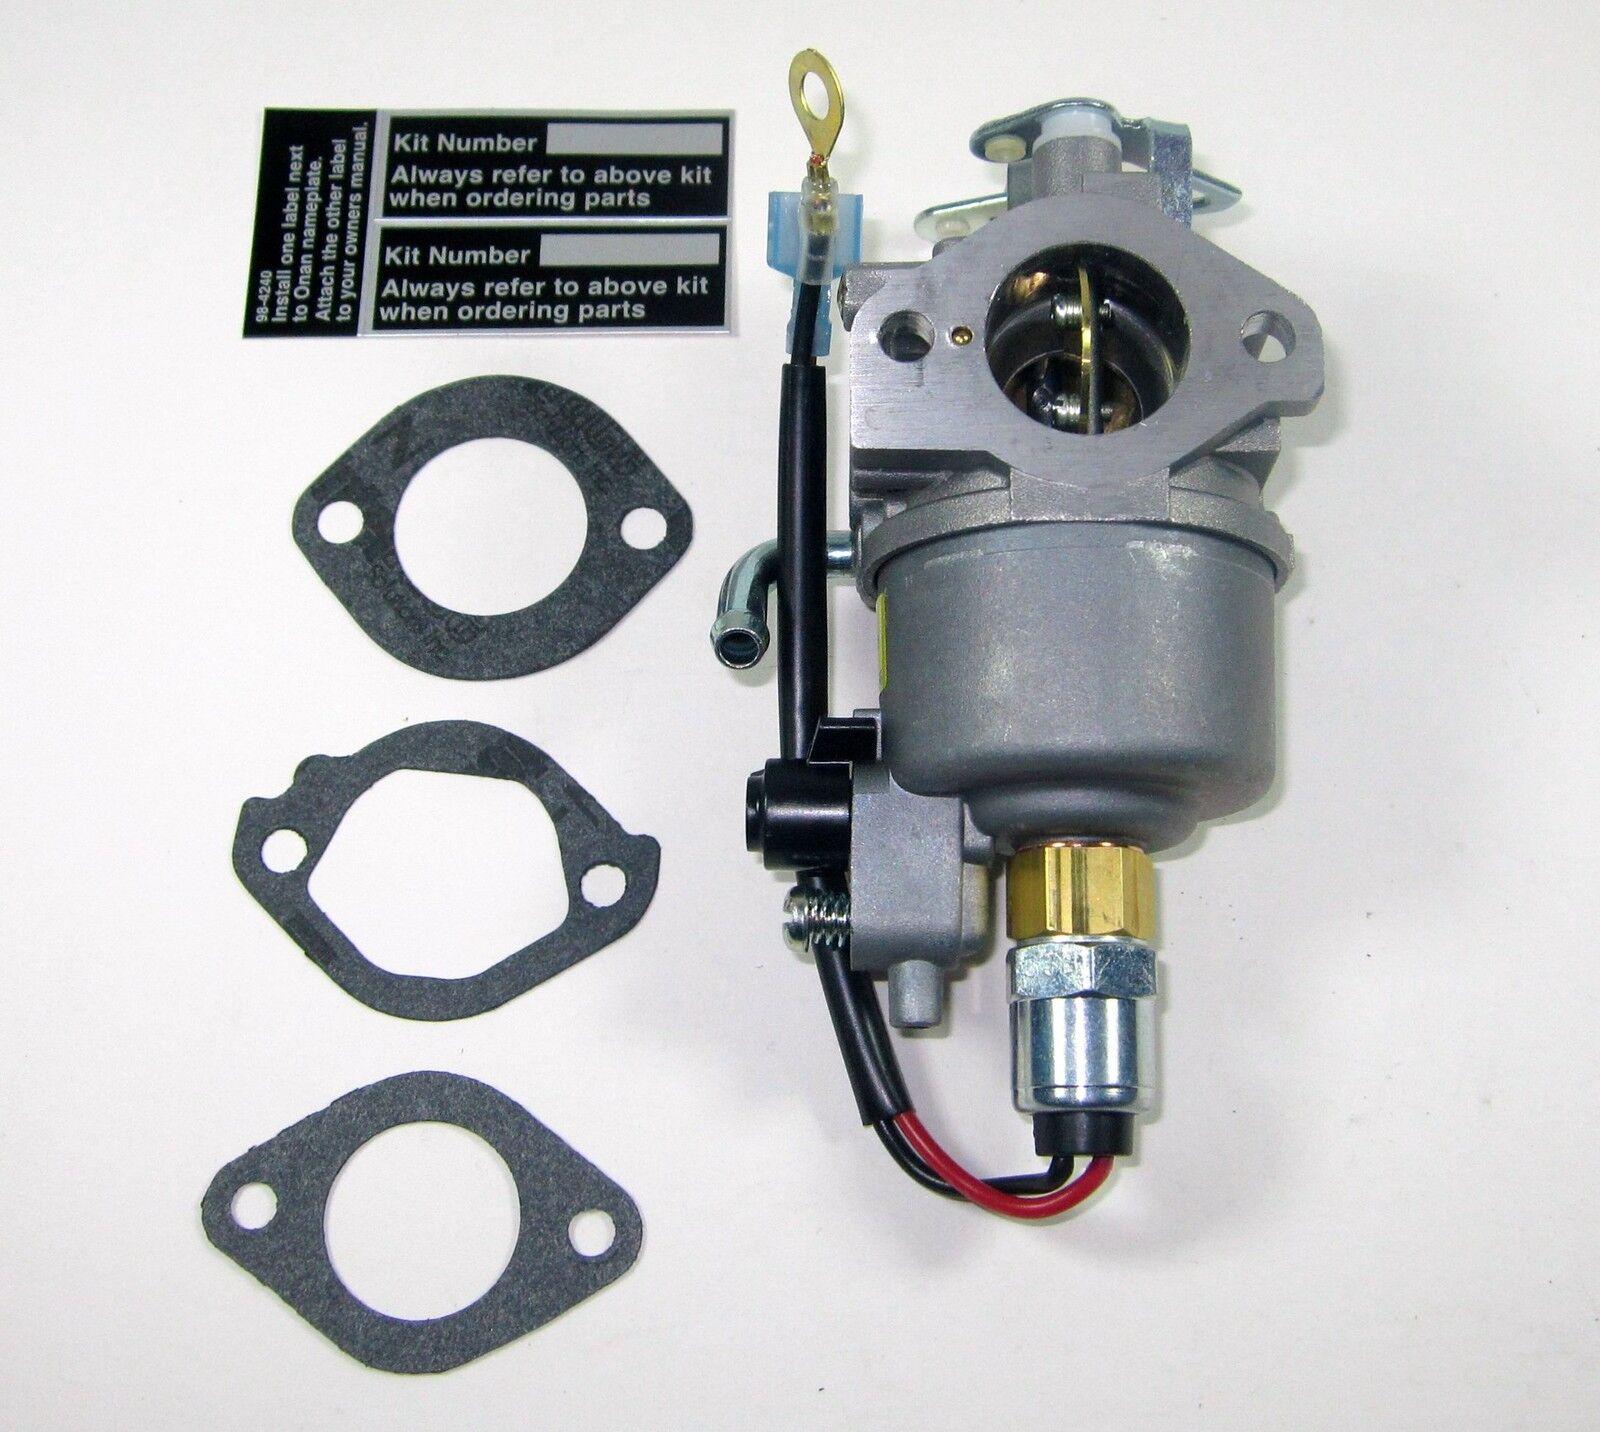 Onan Generator 4000 Schematic Onan Microlite 4000 Wiring: RV.Net Open Roads Forum: Class C Motorhomes: Onan Generator